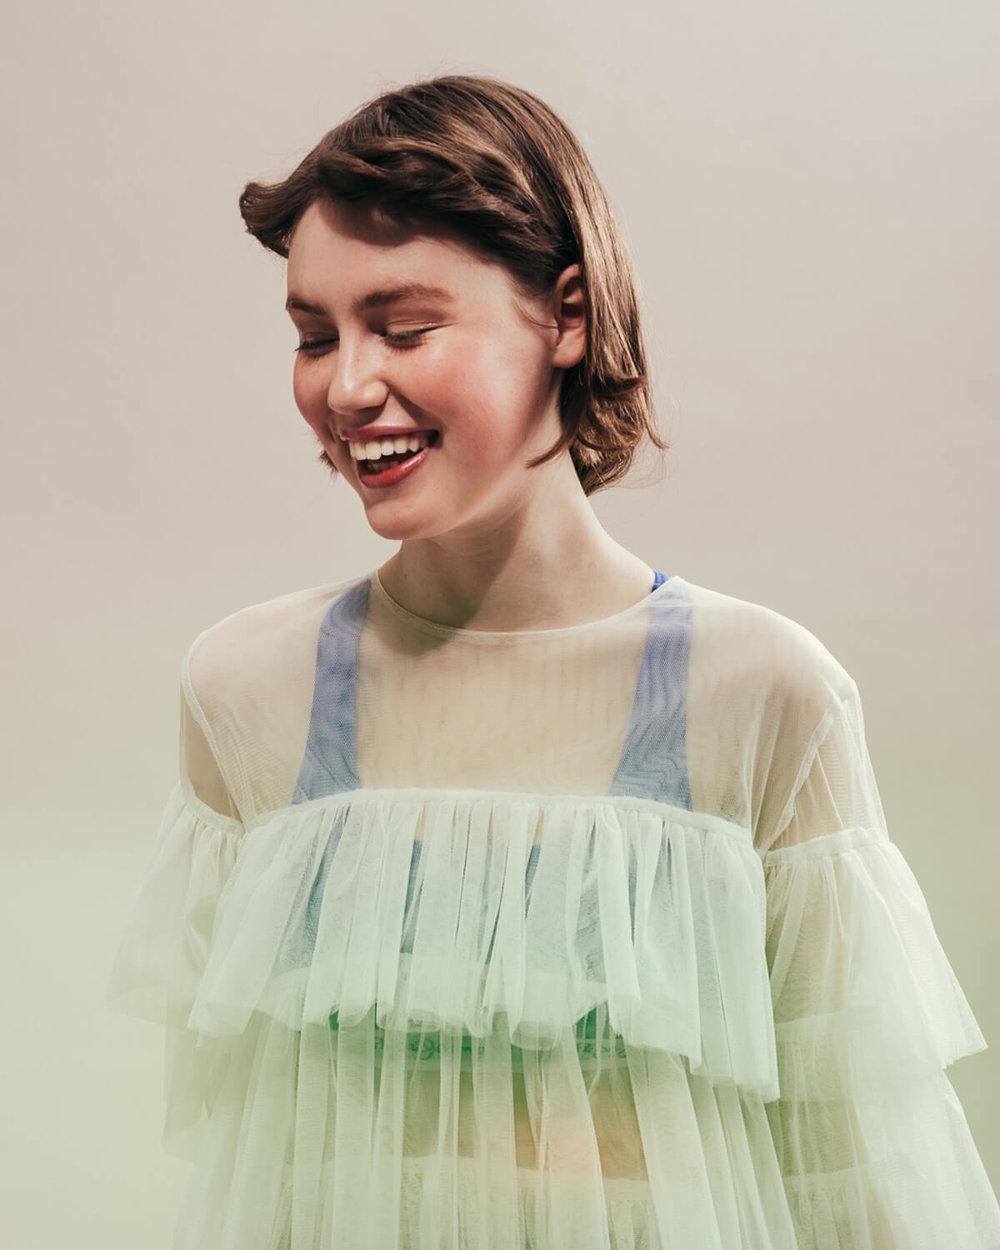 portrait photographer Tim Cole shoots girl in the studio